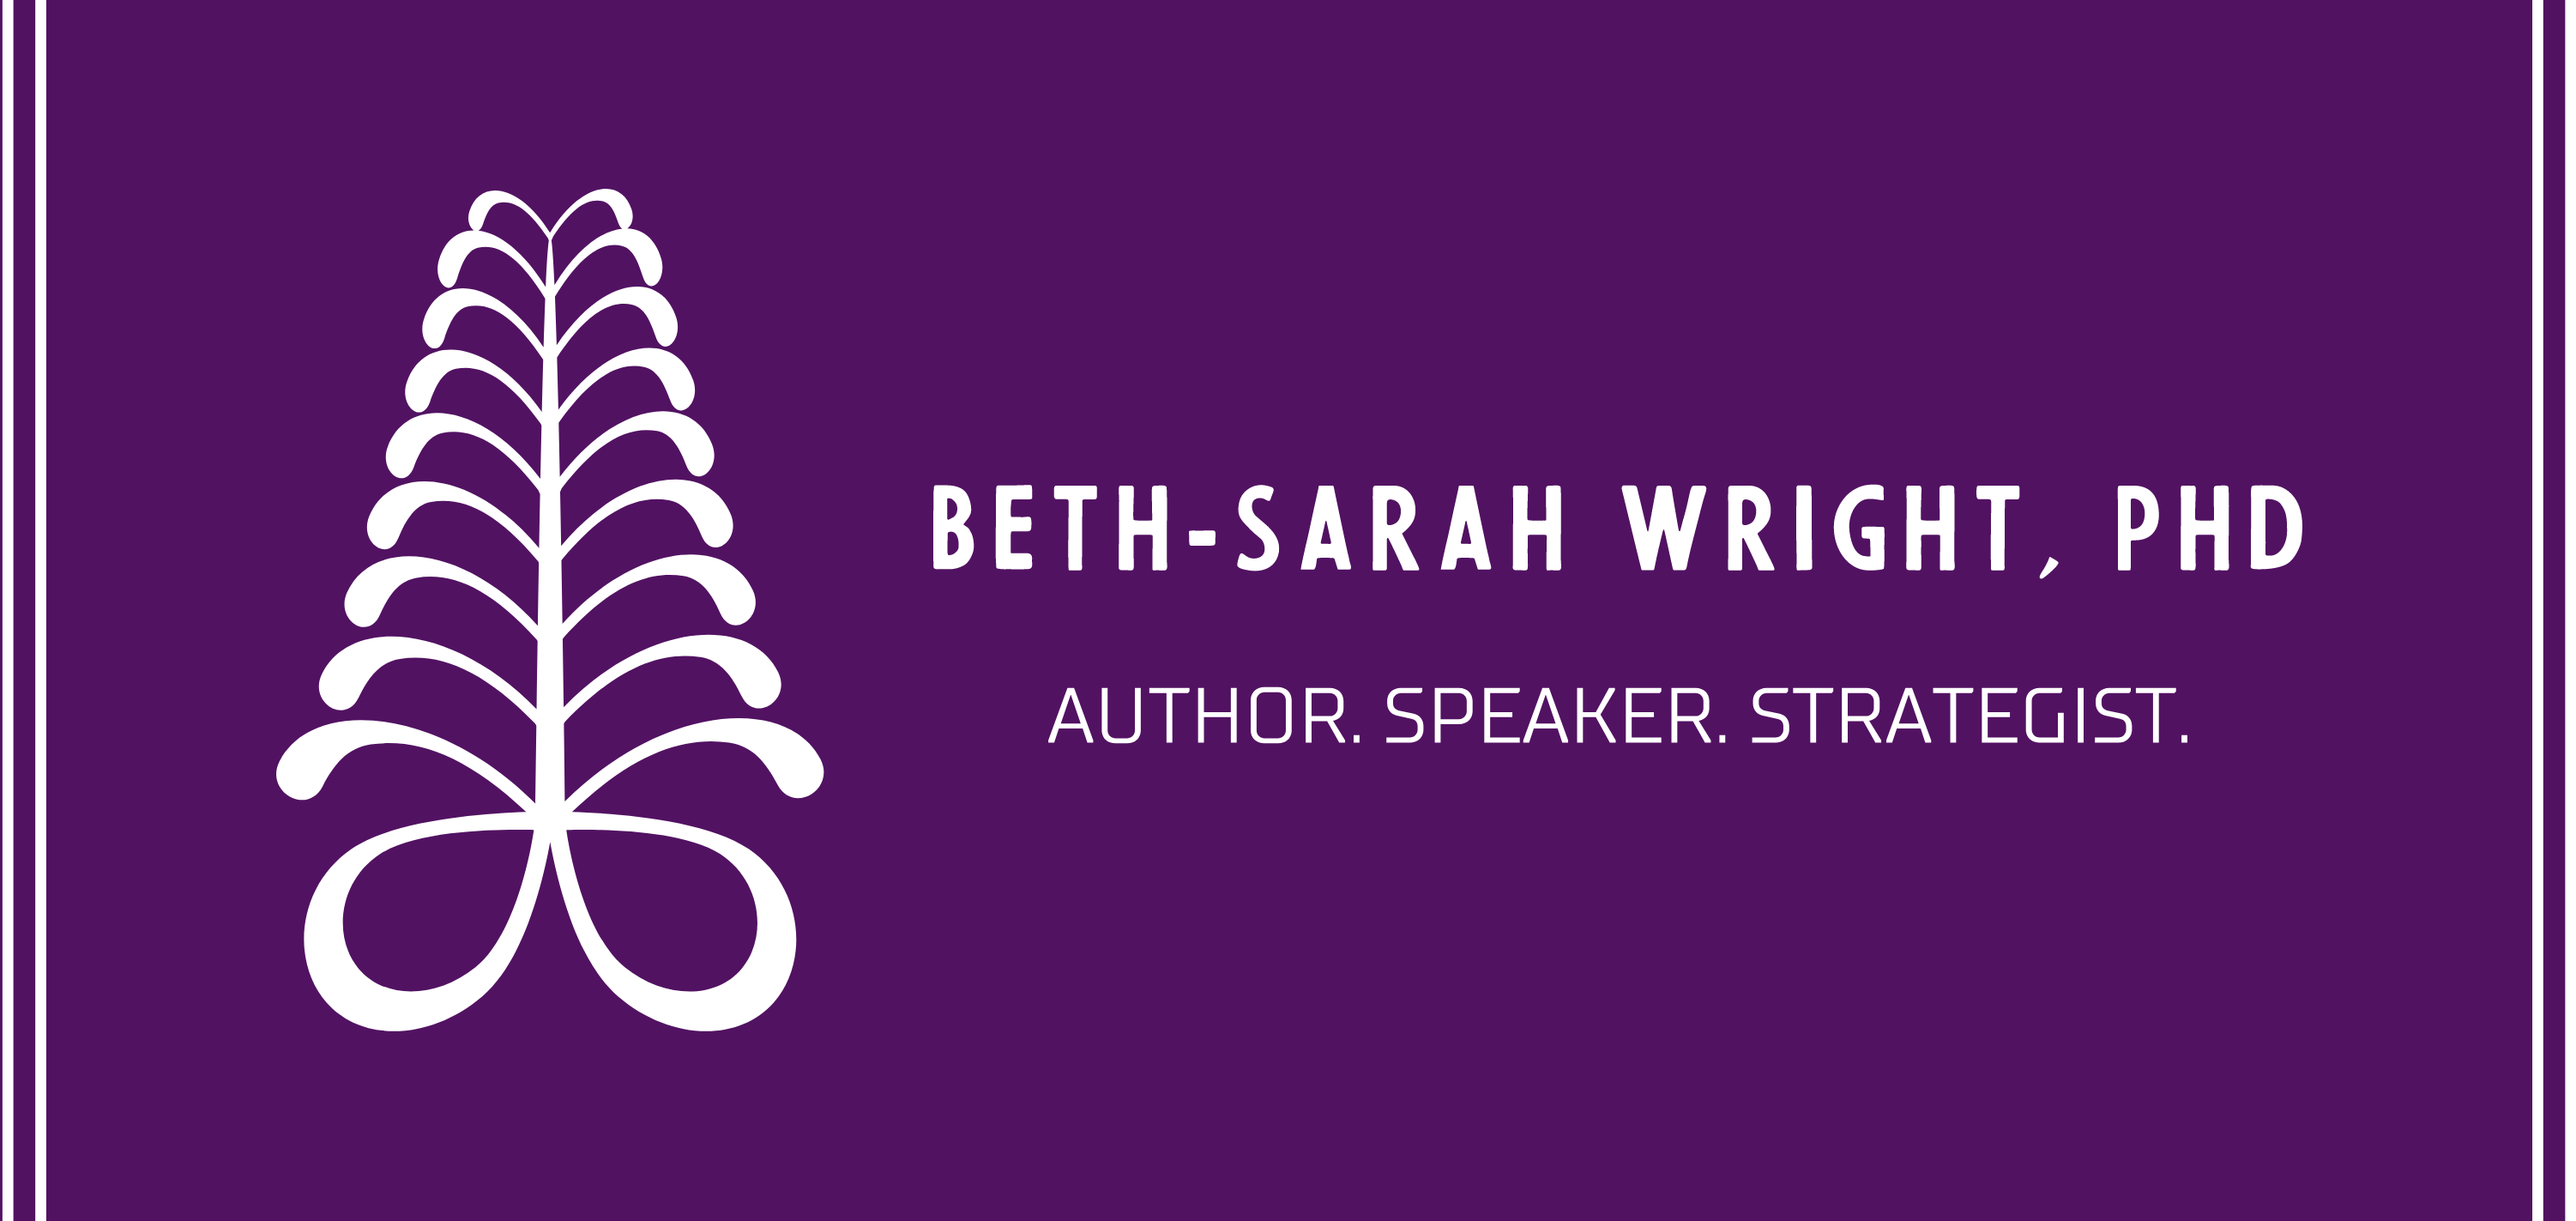 Dr. Beth-Sarah Wright